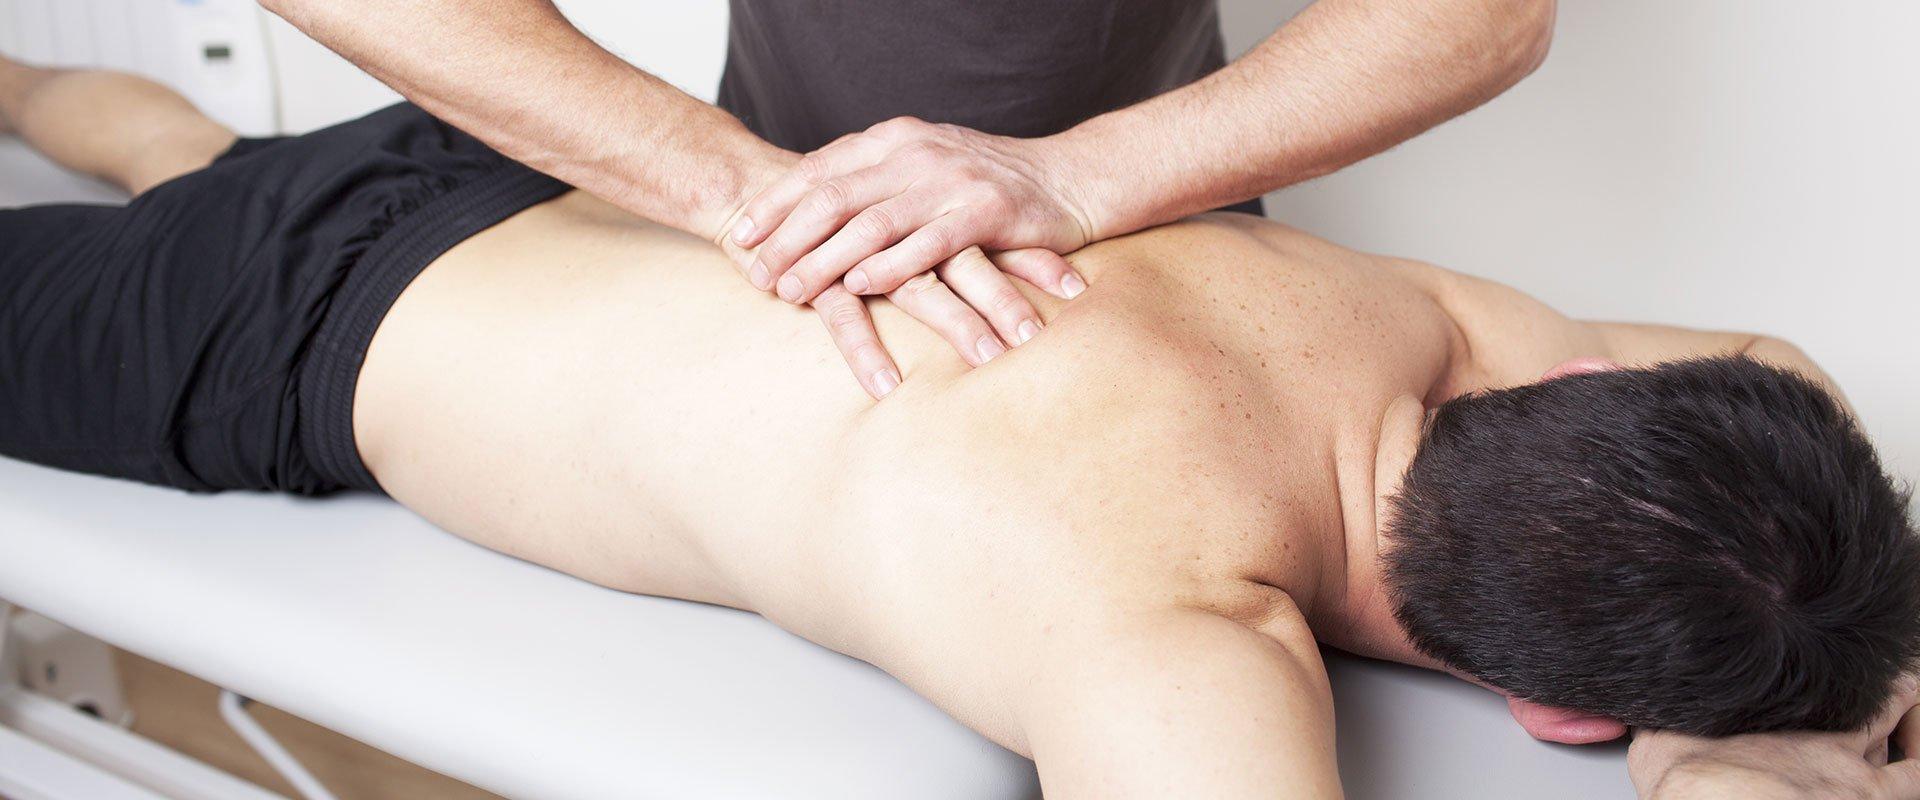 Qualified chiropractor